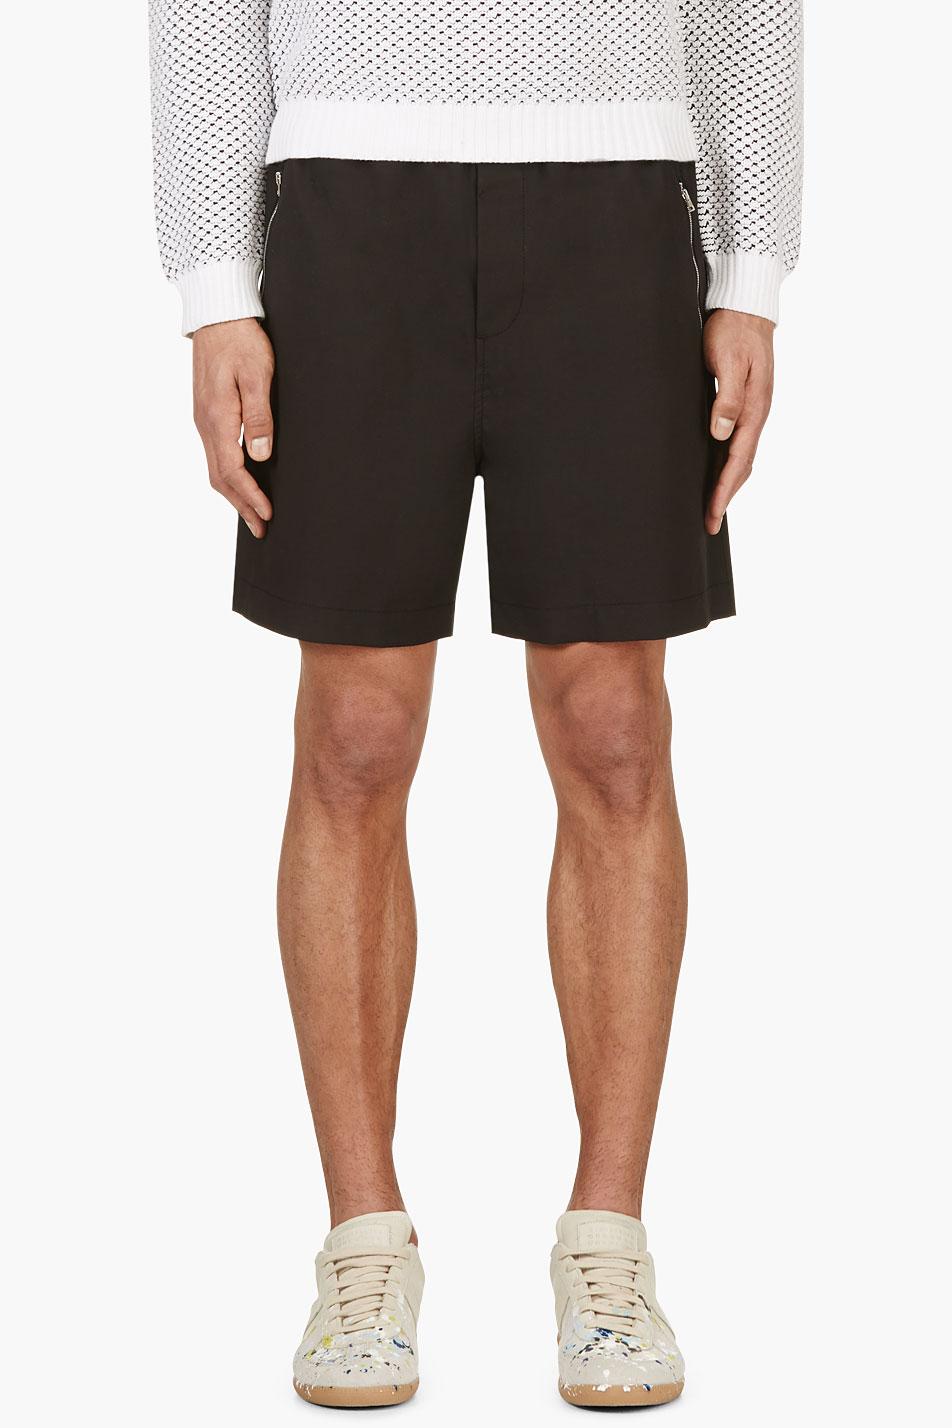 Marni black stretch waist shorts